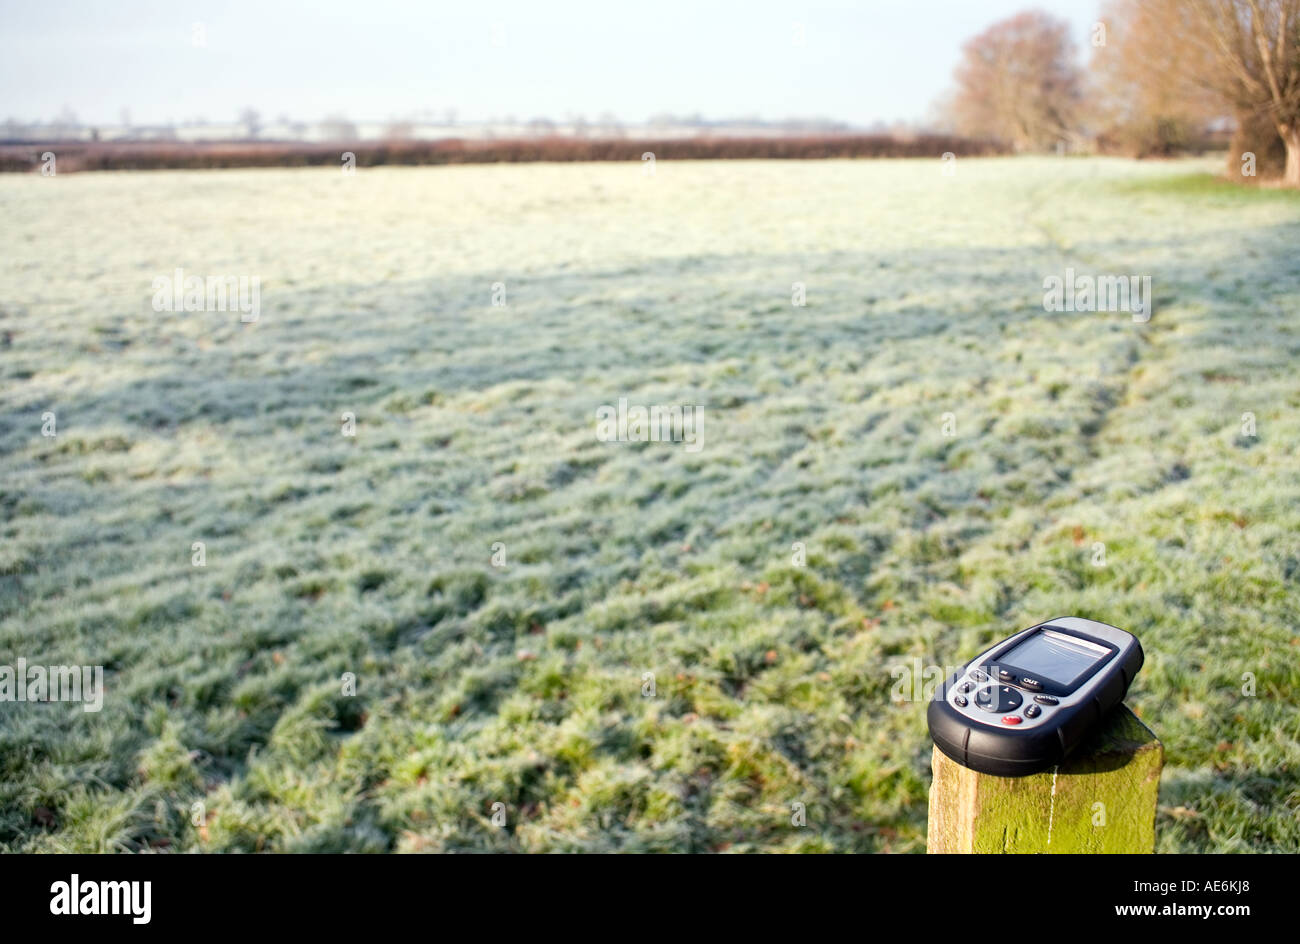 GPS unit on gatepost farmland Somerset GPS unit receiver navigation orienteering frost gate post gatepost cold winter day crisp - Stock Image